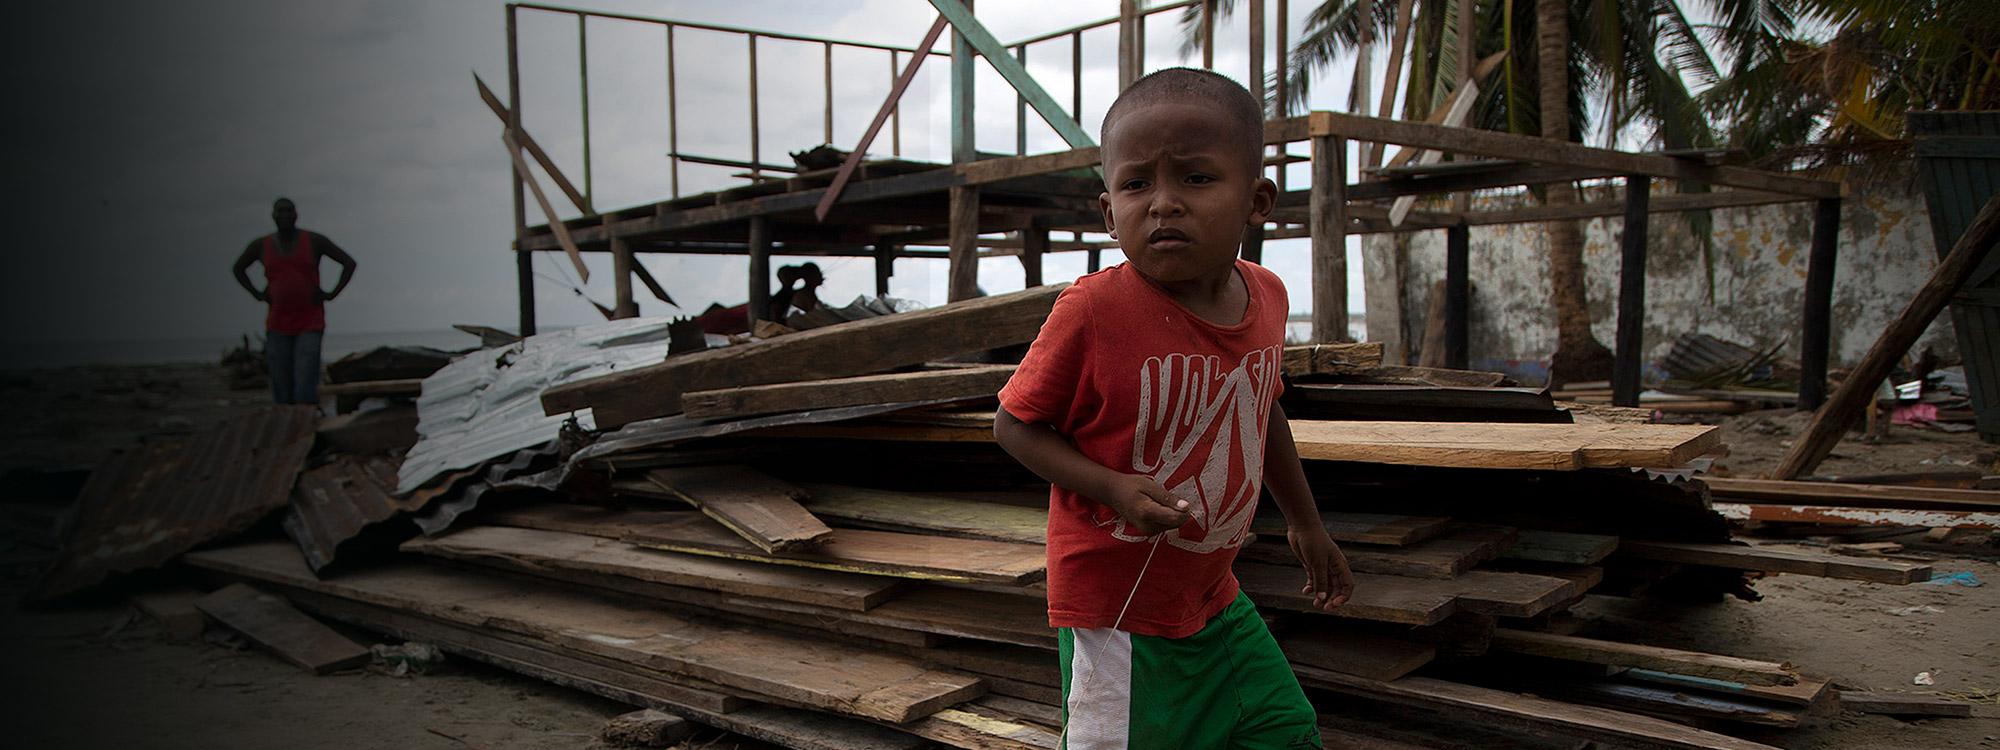 Child affected by Hurricane Iota